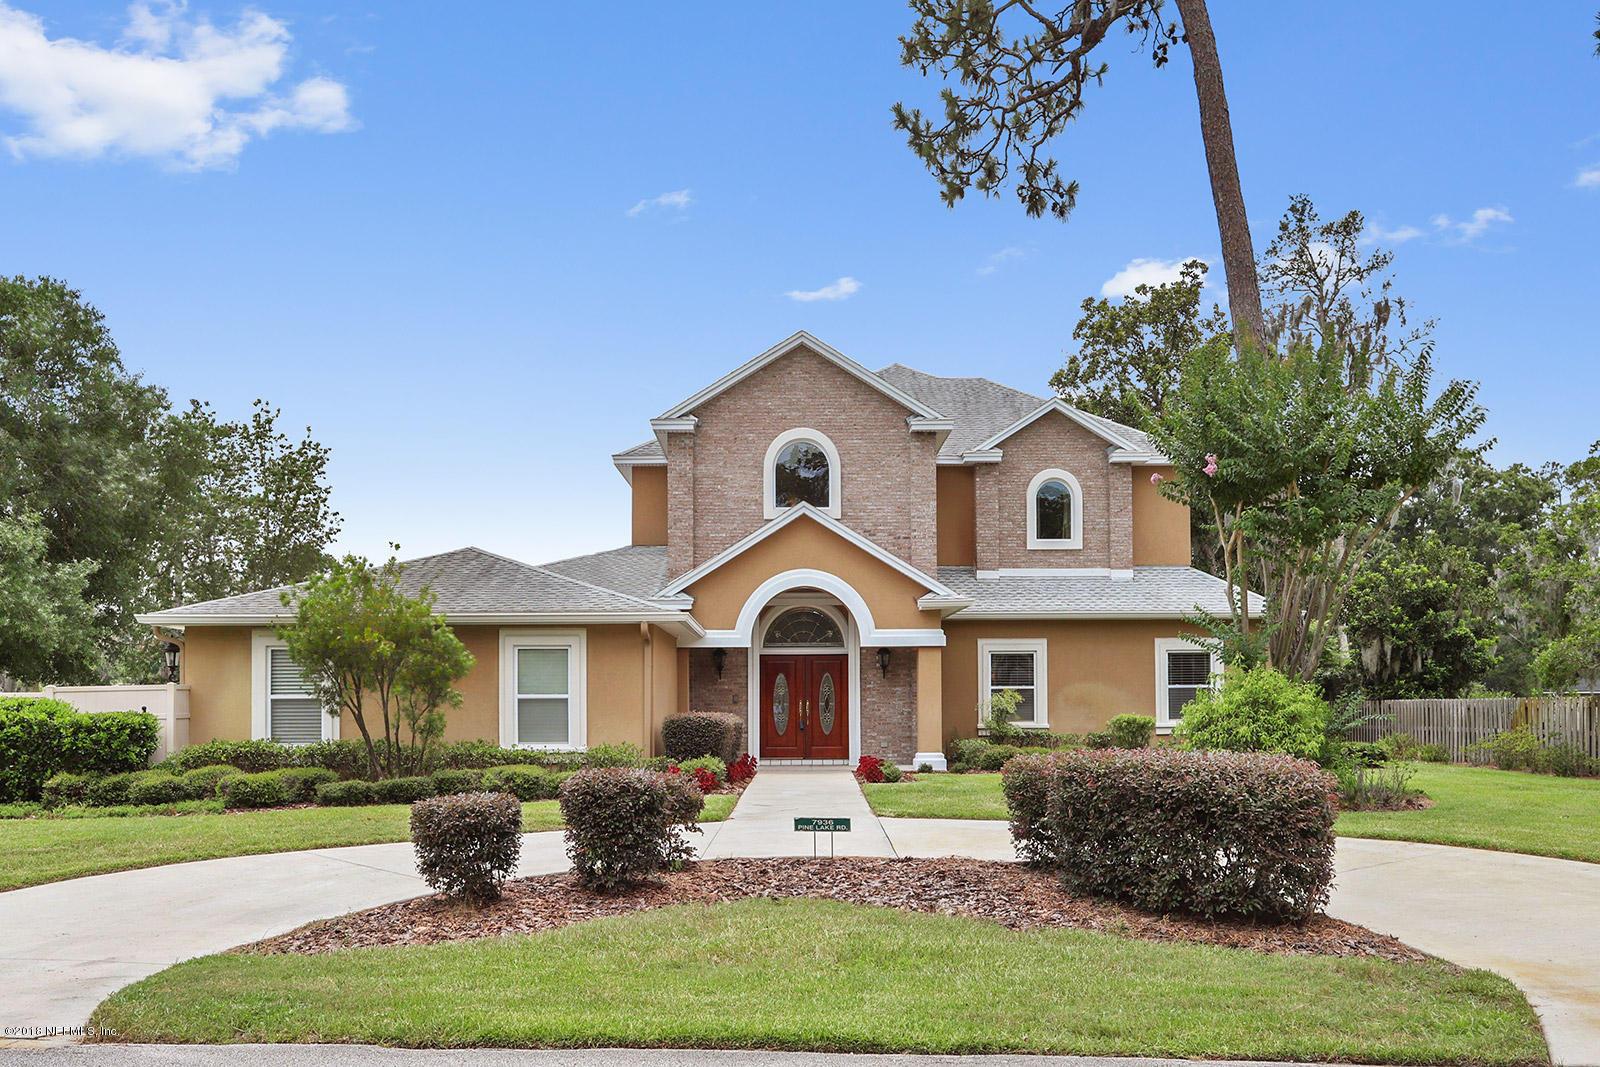 7936 PINE LAKE, JACKSONVILLE, FLORIDA 32256, 4 Bedrooms Bedrooms, ,4 BathroomsBathrooms,Residential - single family,For sale,PINE LAKE,943469